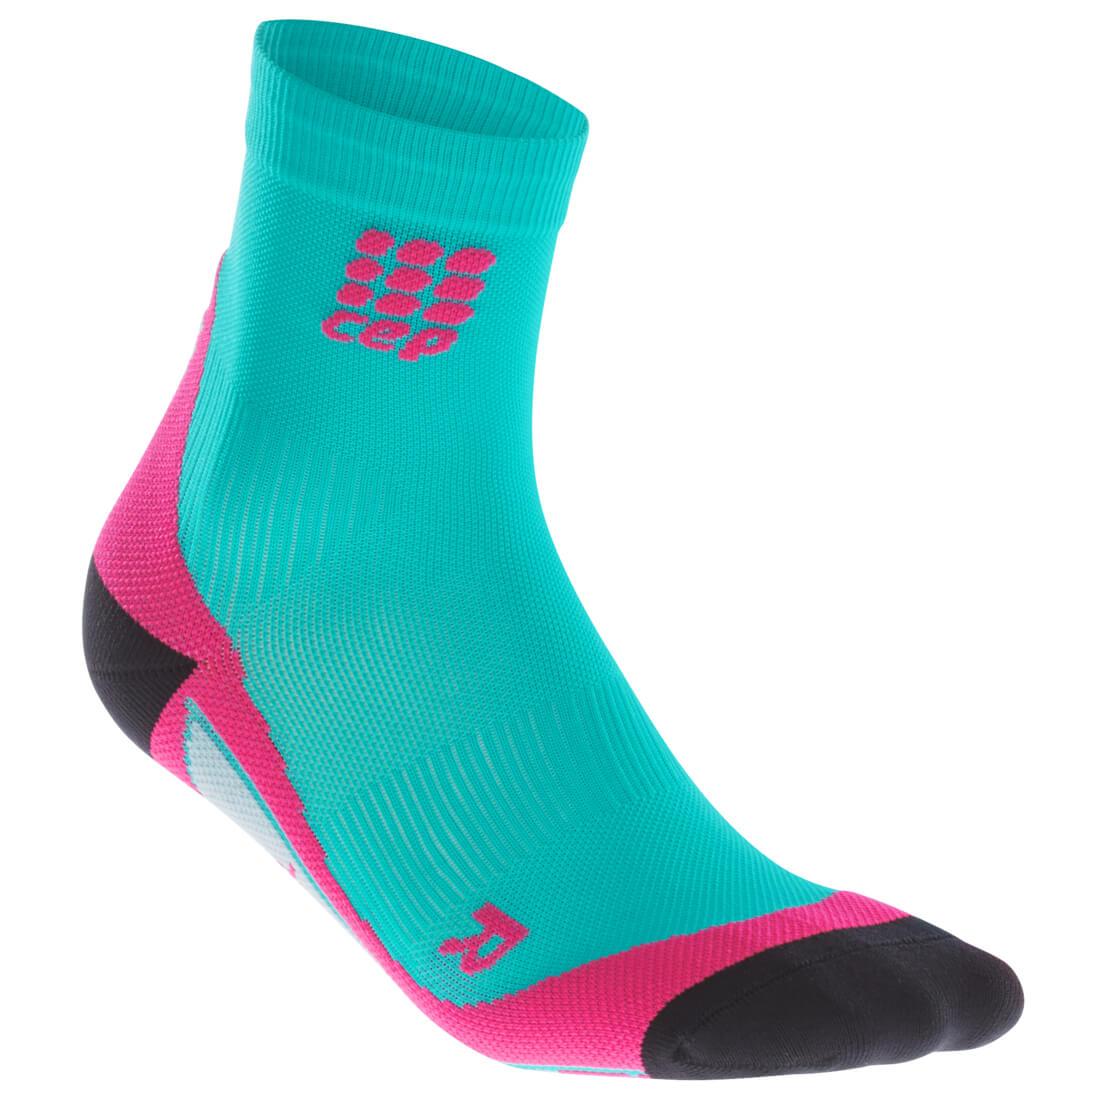 CEP - Women's Short Socks - Kompressionssocken Lagoon / Pink